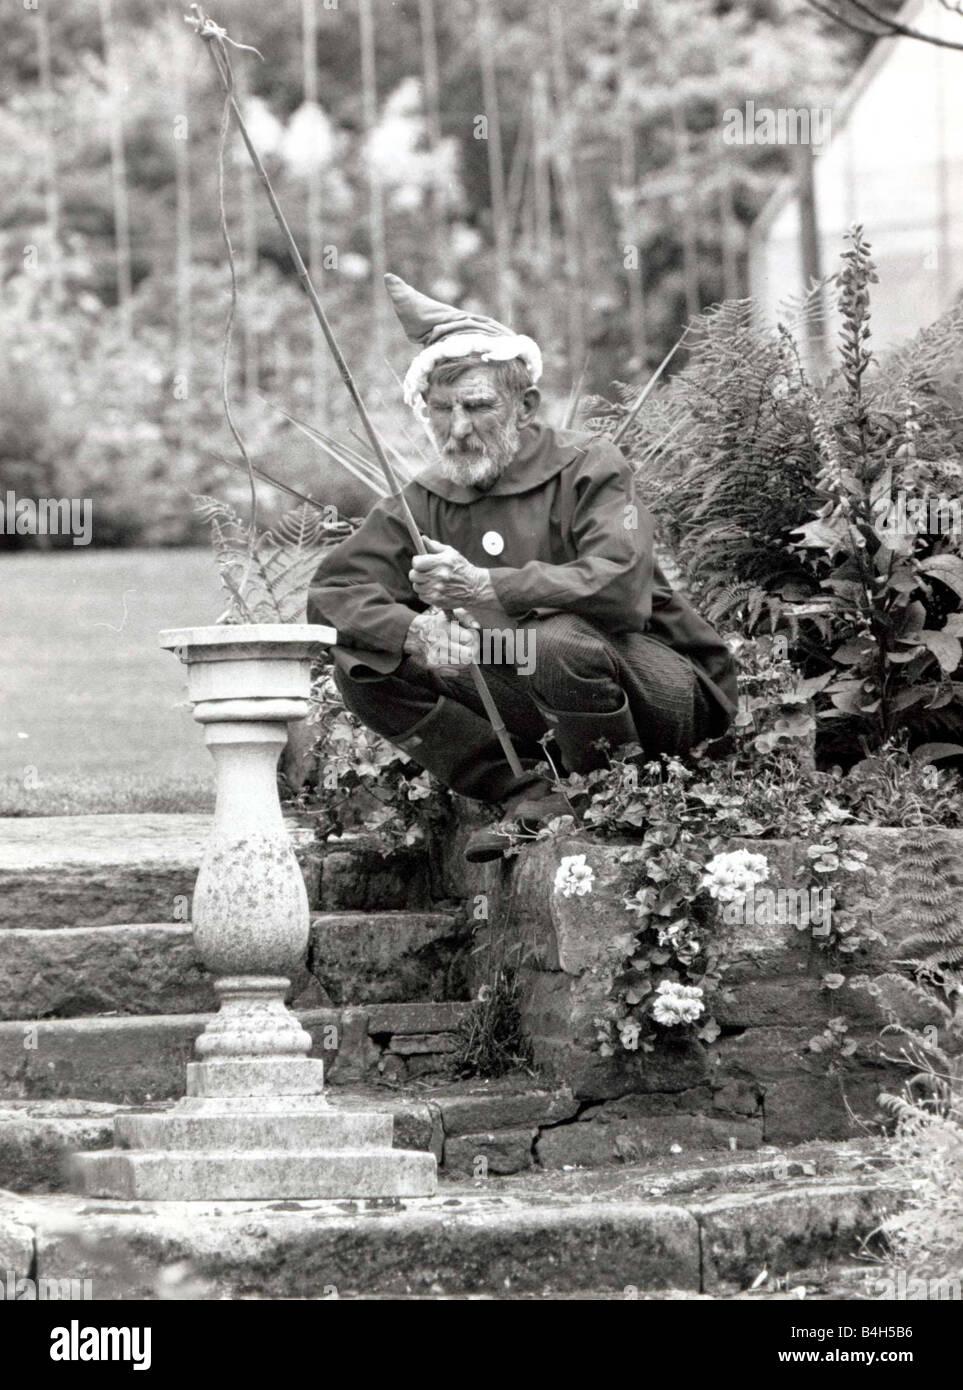 Walter Sherratt aged 67 is posing as a garden gnome in his garden at Biddulph near Stoke on Trent He loves to make - Stock Image